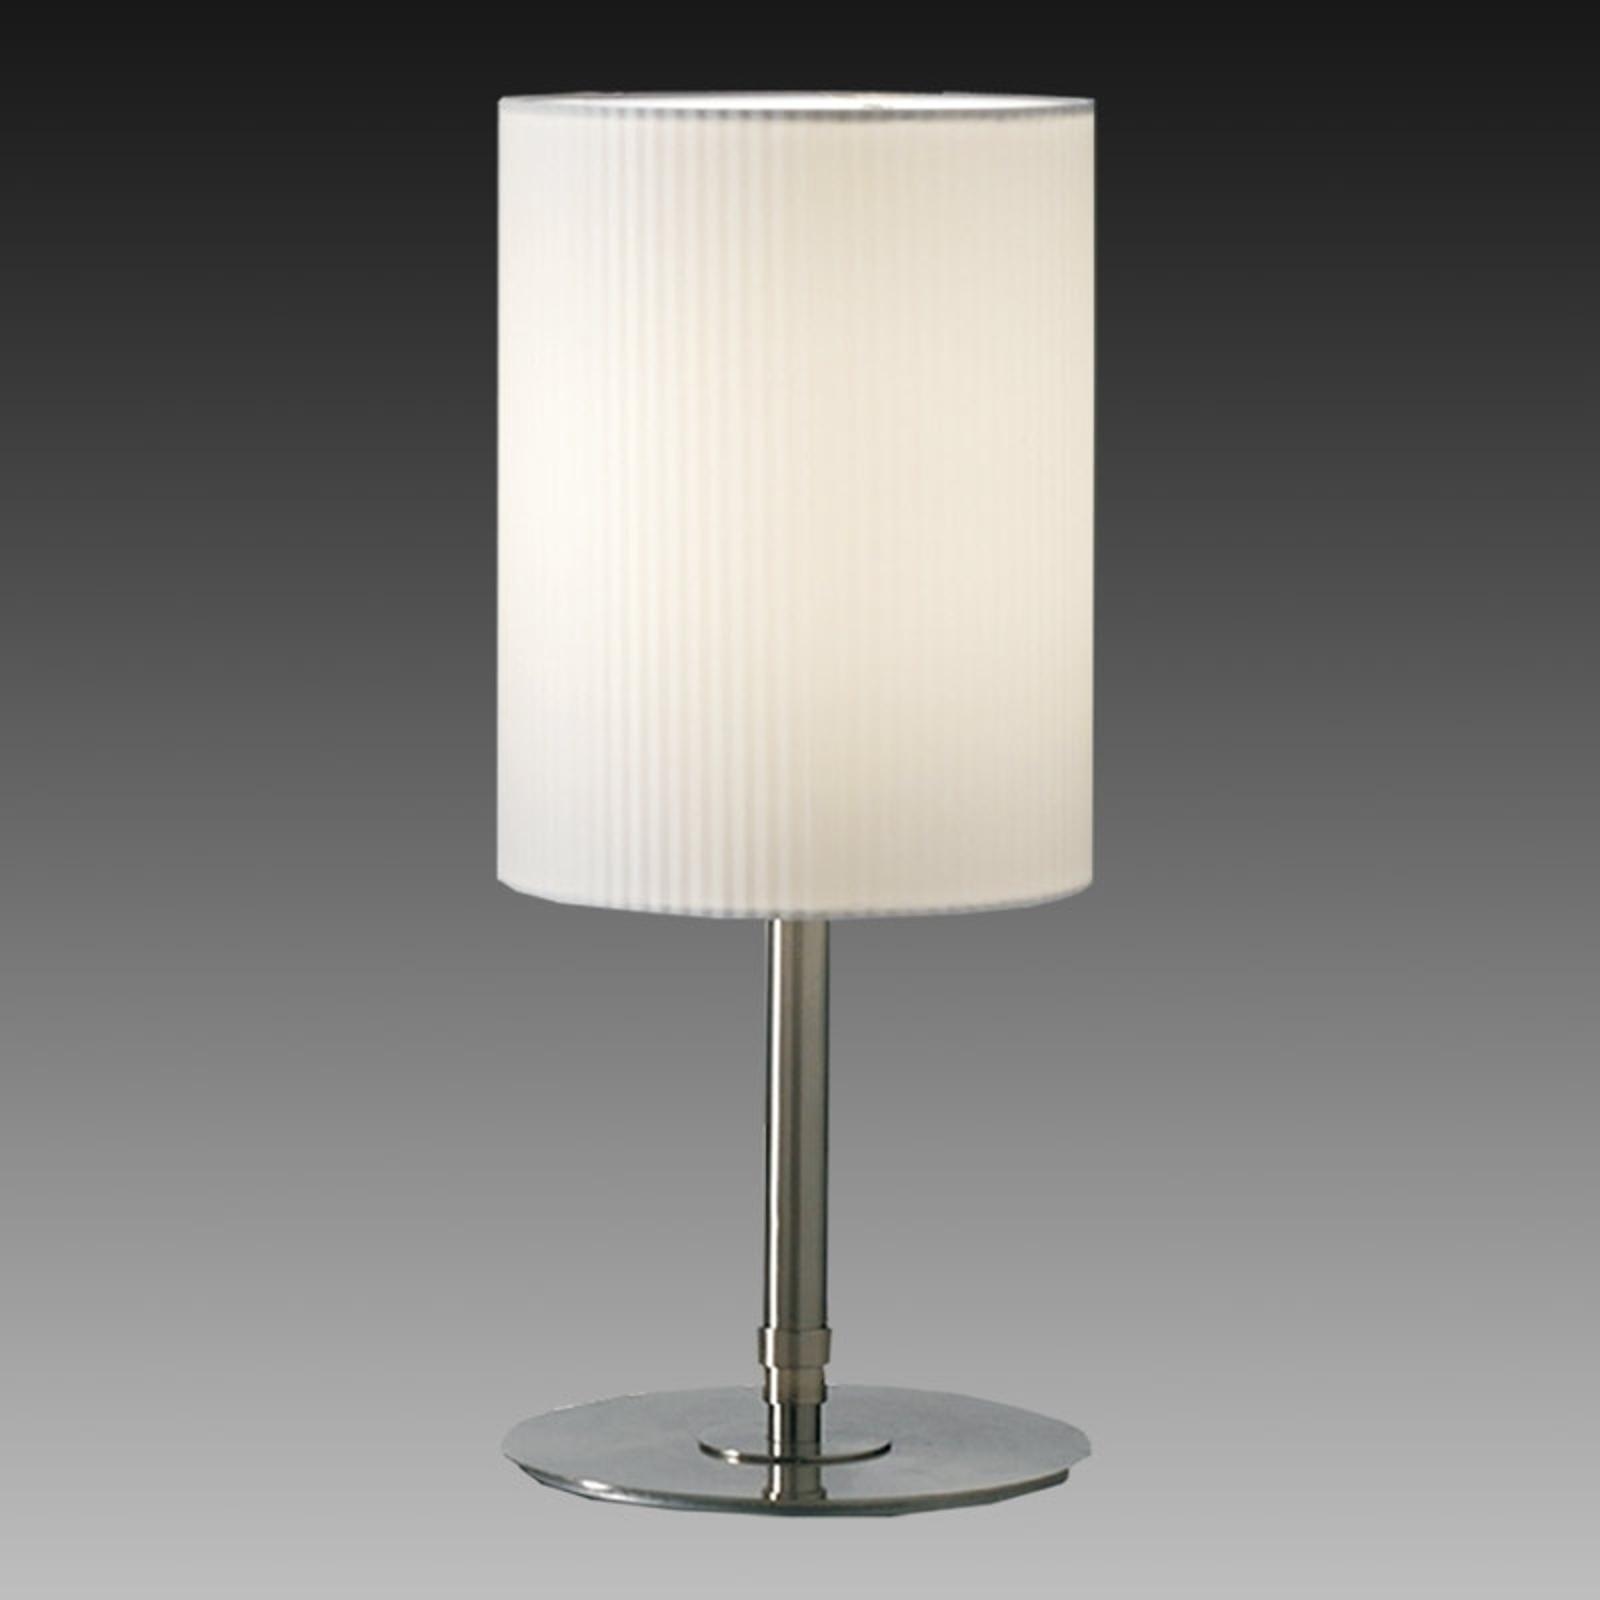 Nastrojowa lampa stołowa BENITO, 40 cm